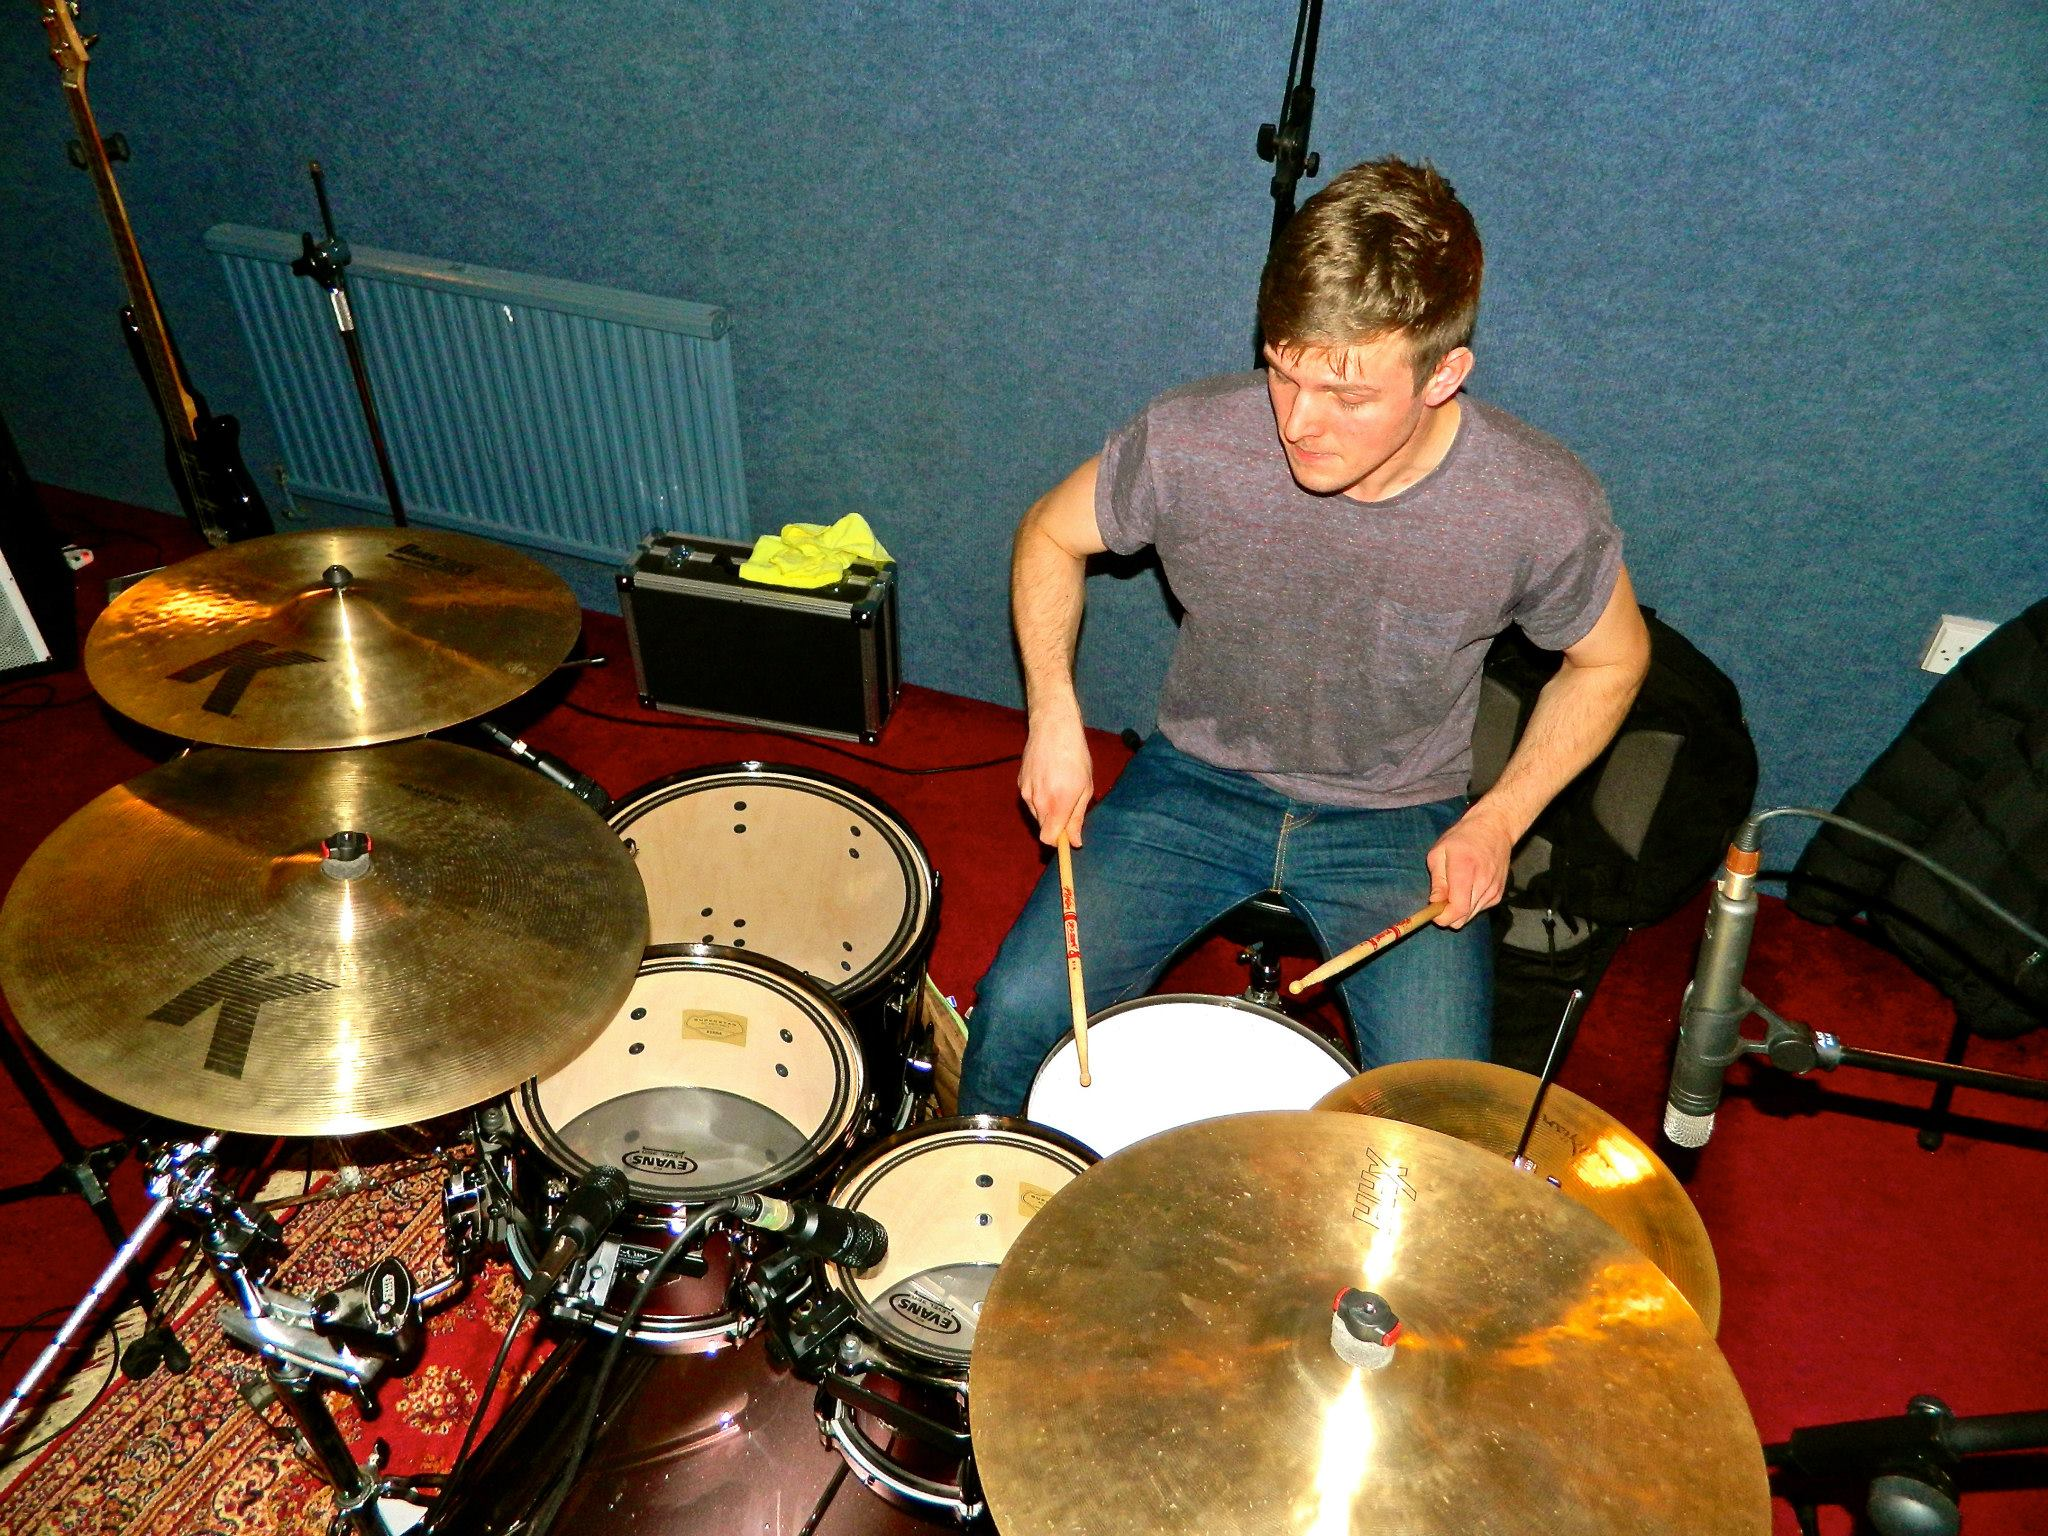 professional drummer | Tumblr